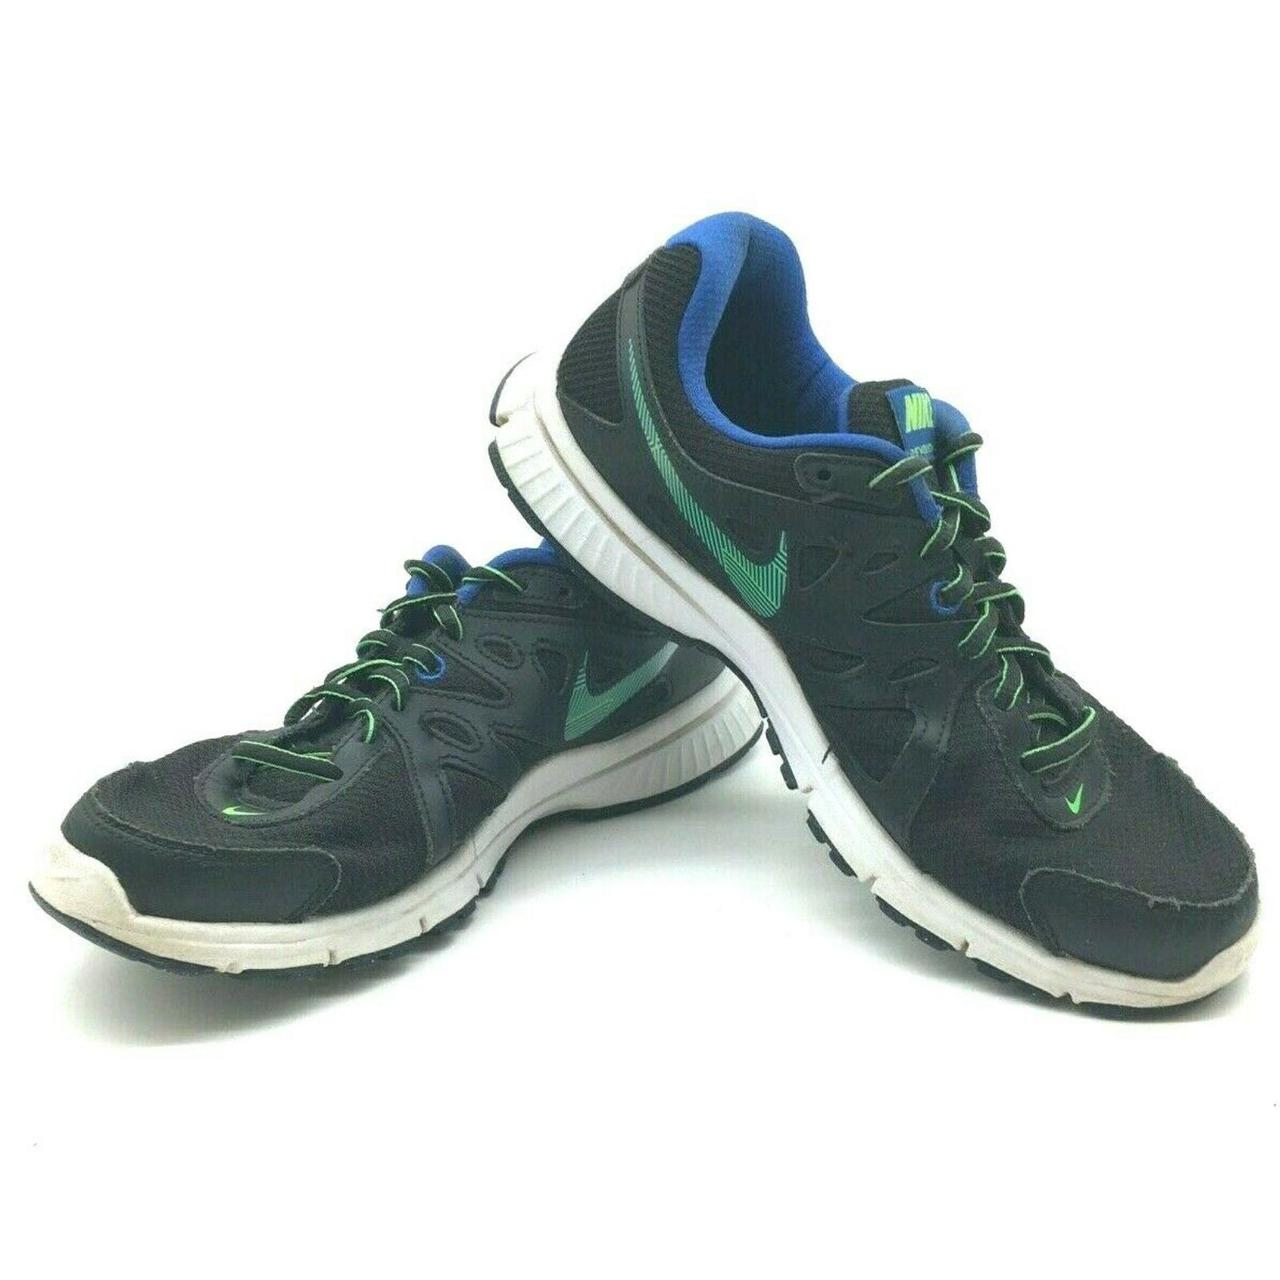 Product Image 1 - Nike Shoes Women's Size 8.5